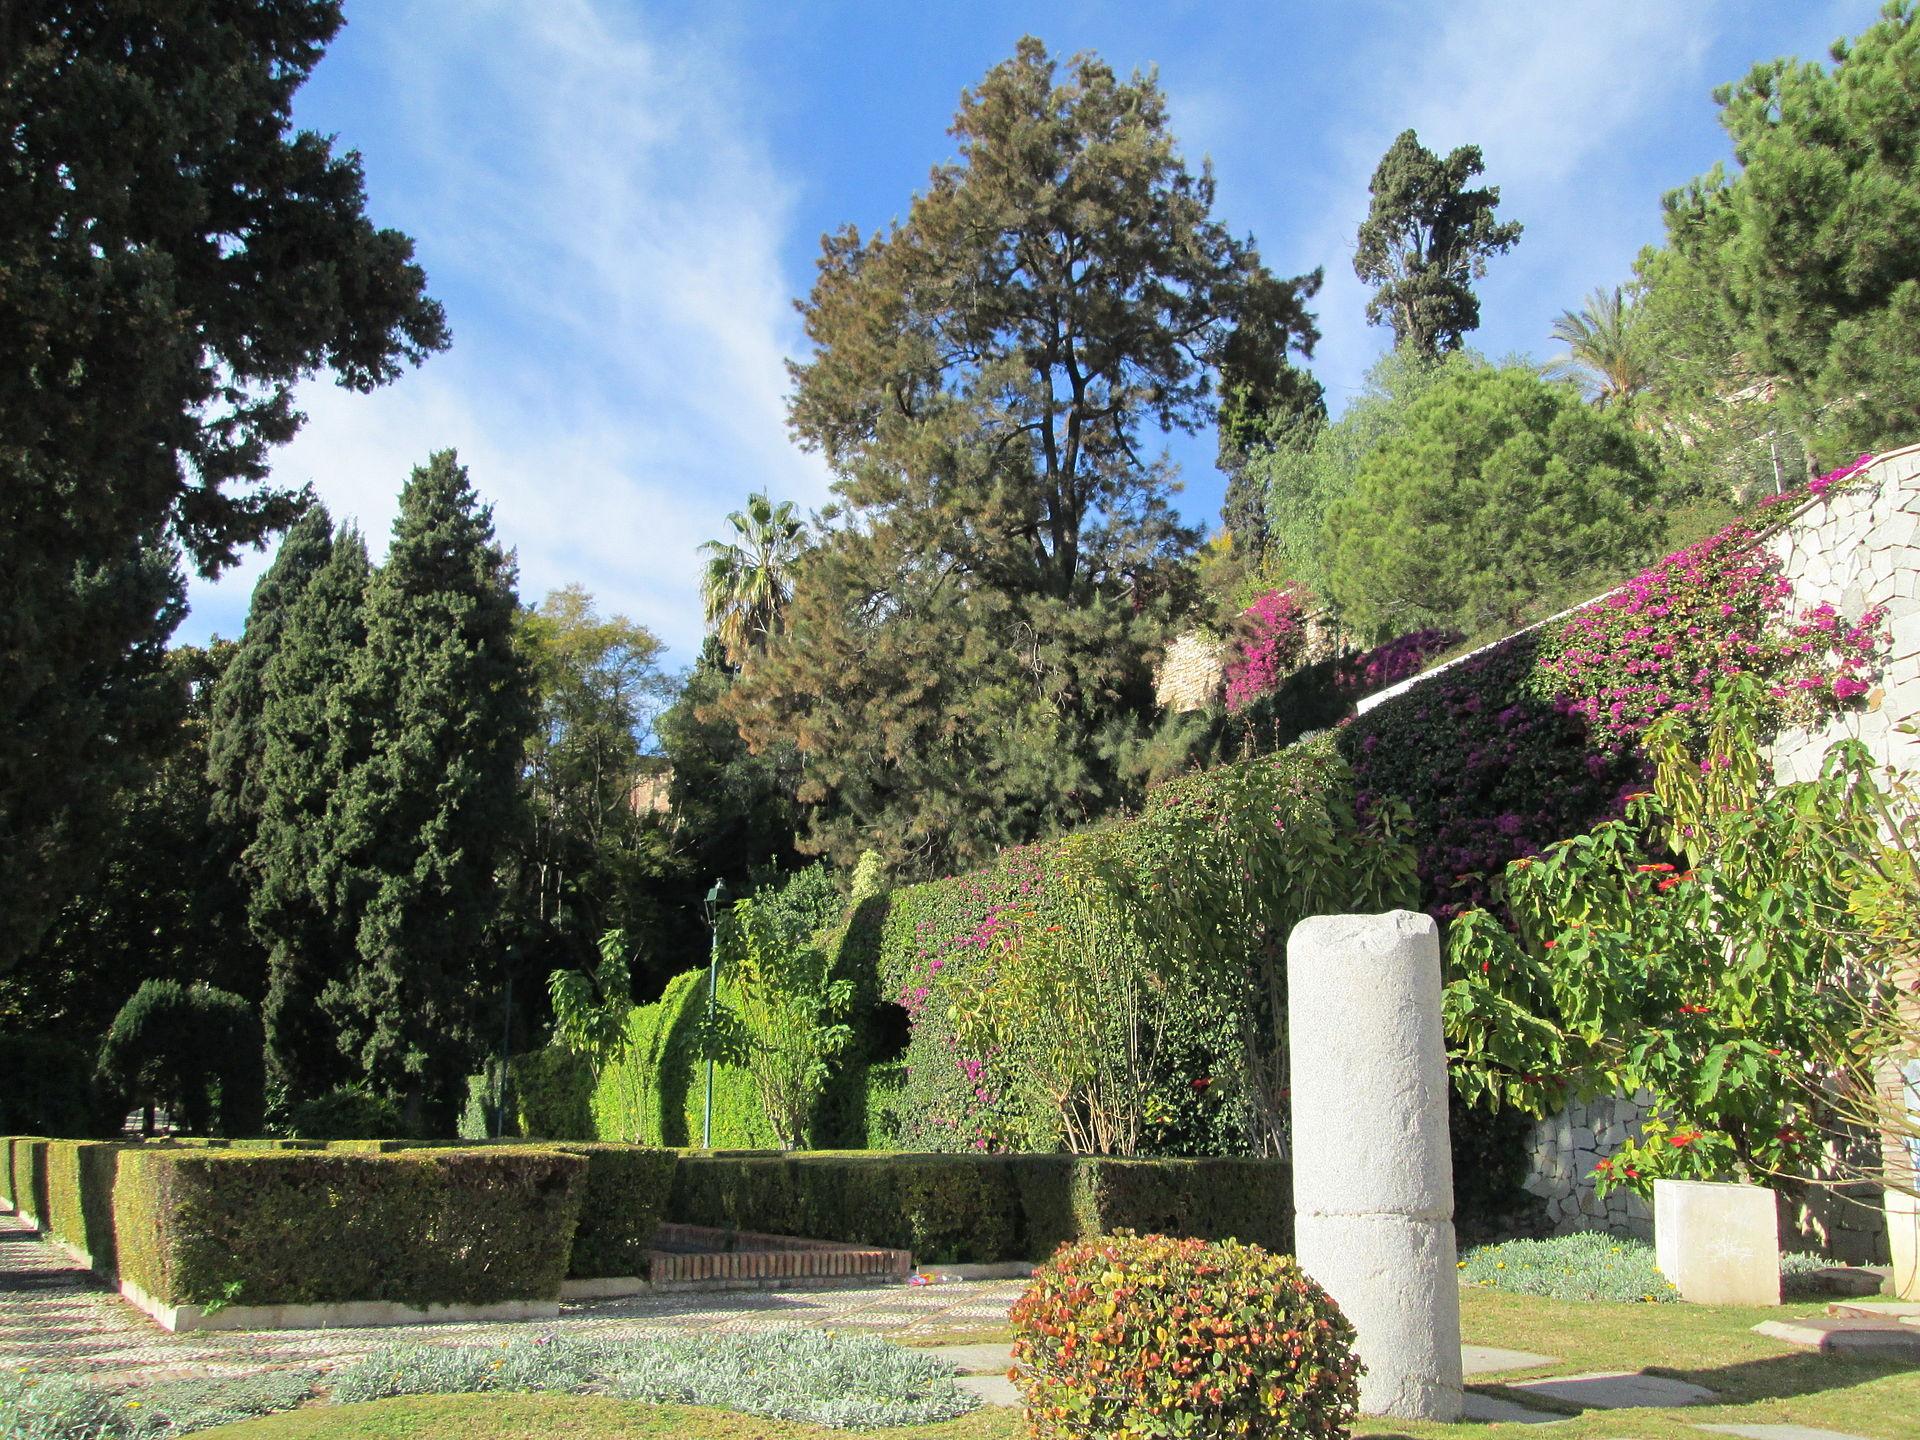 jardines de puerta oscura wikipedia la enciclopedia libre